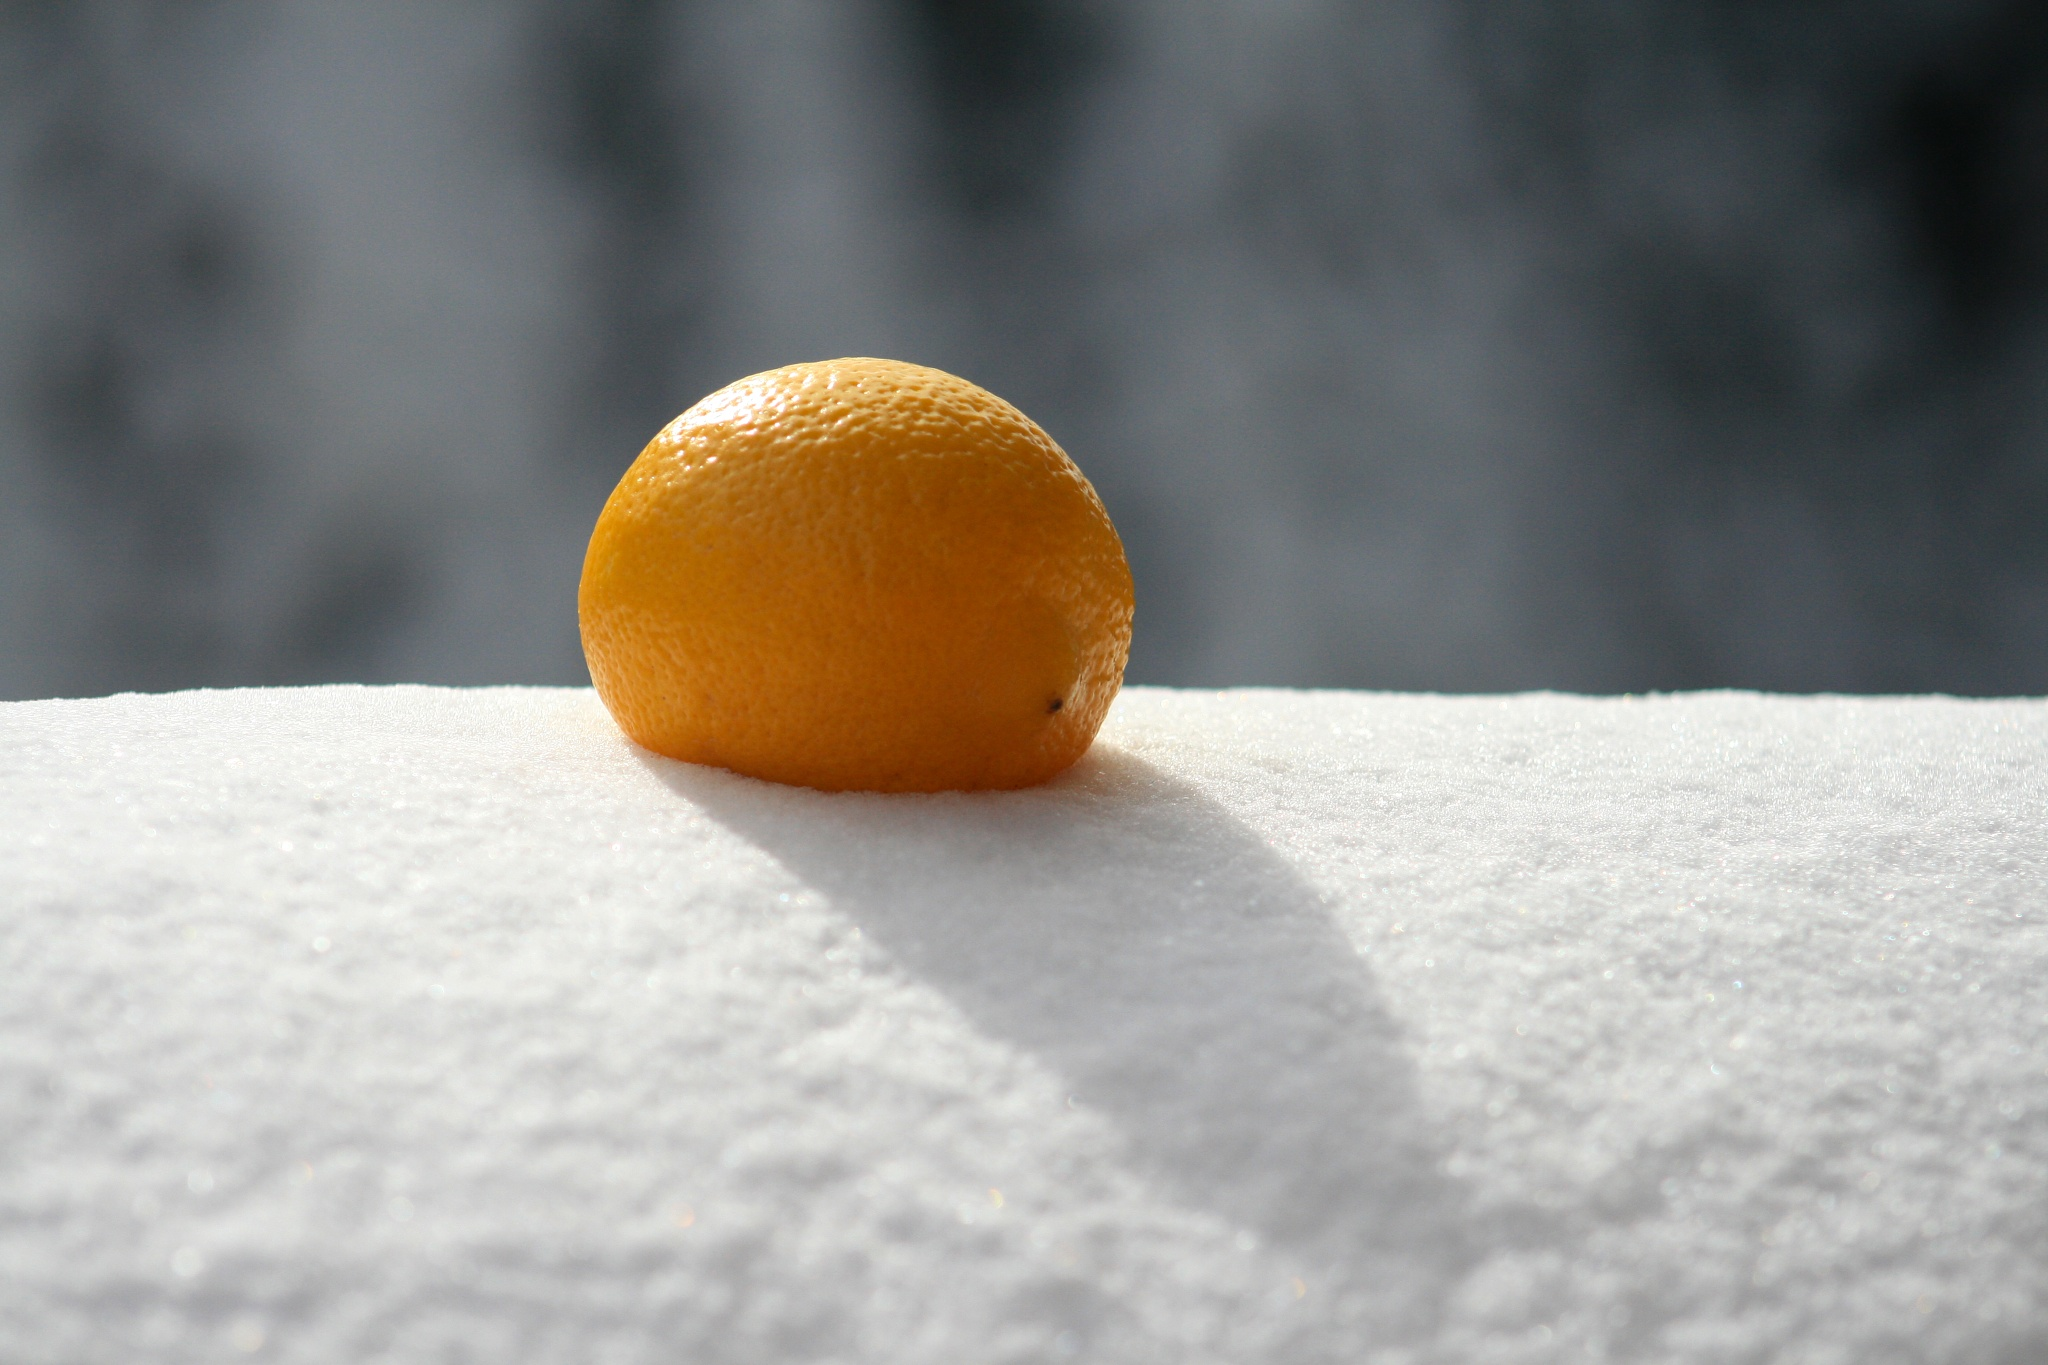 Sun Snow Lemon by ʎpɐן uɐıpɐuɐɔ